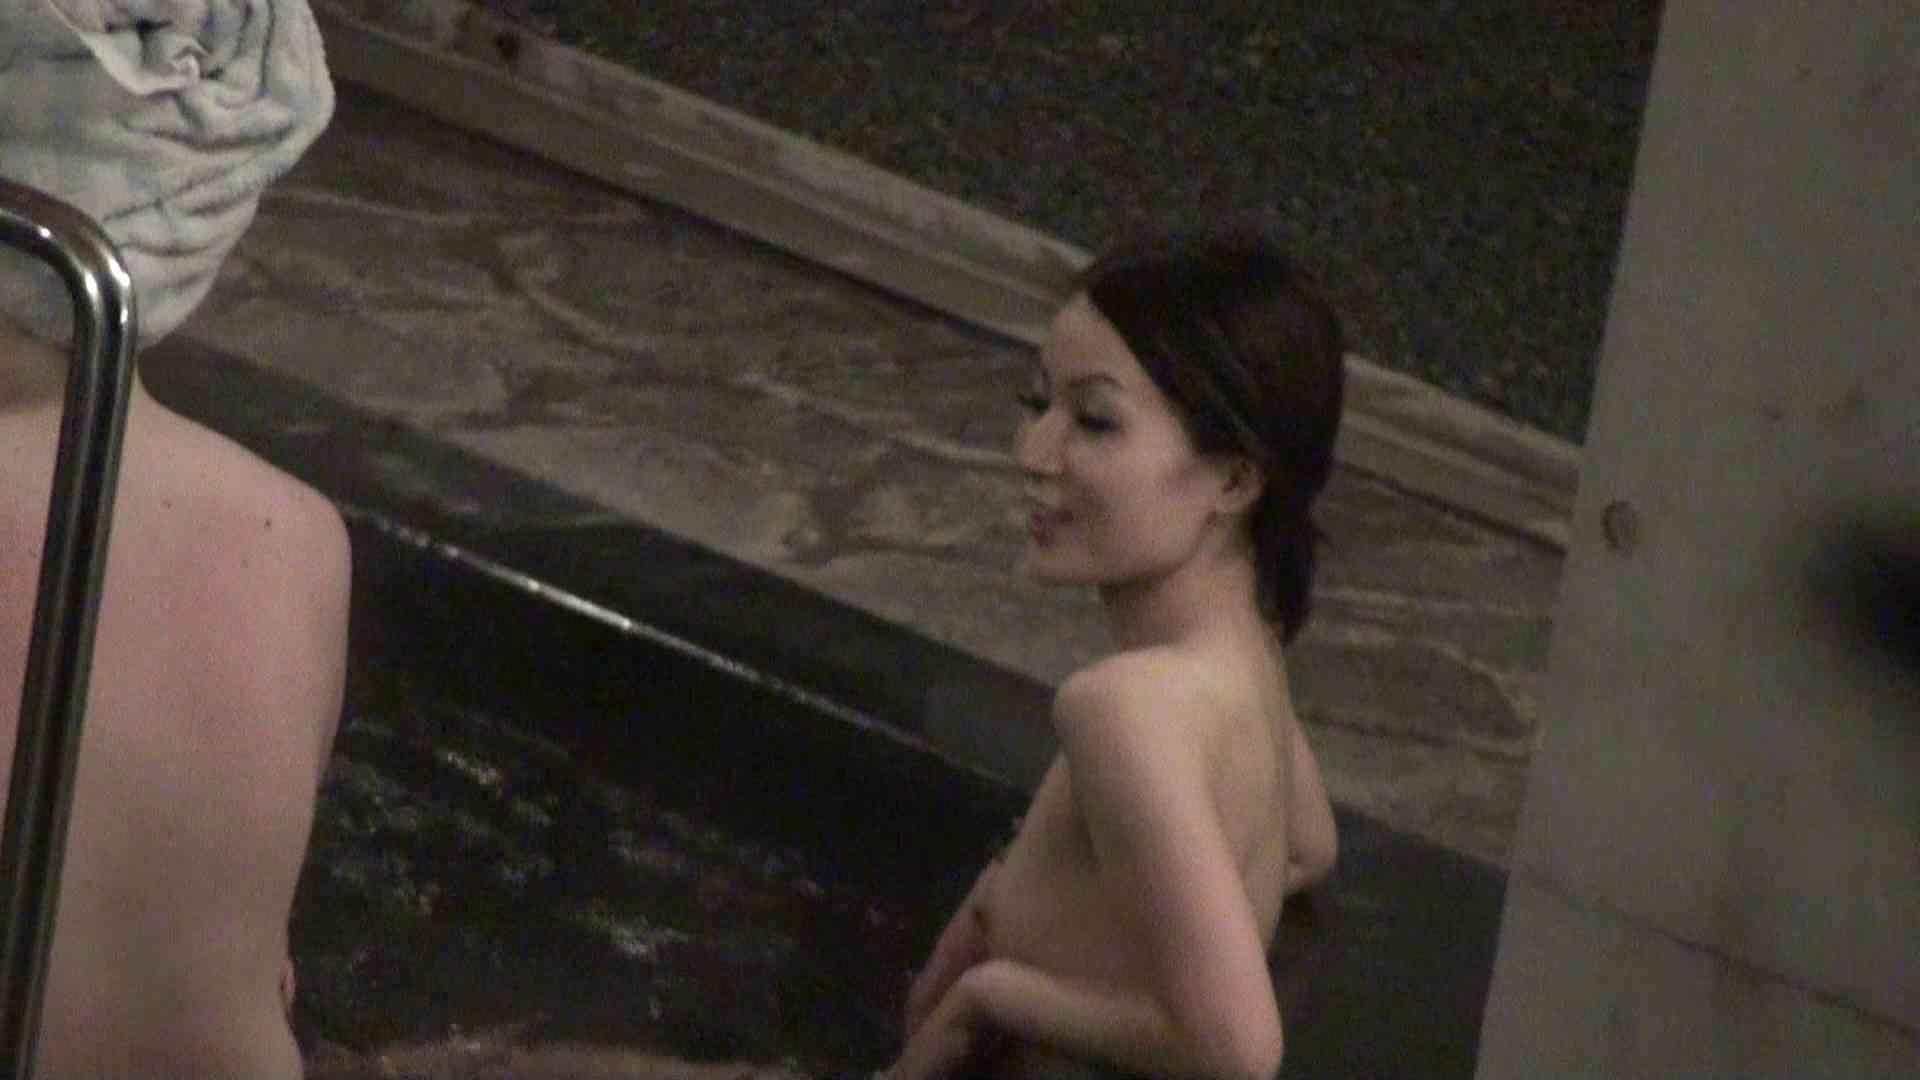 Aquaな露天風呂Vol.373 接写 オマンコ動画キャプチャ 93PIX 76